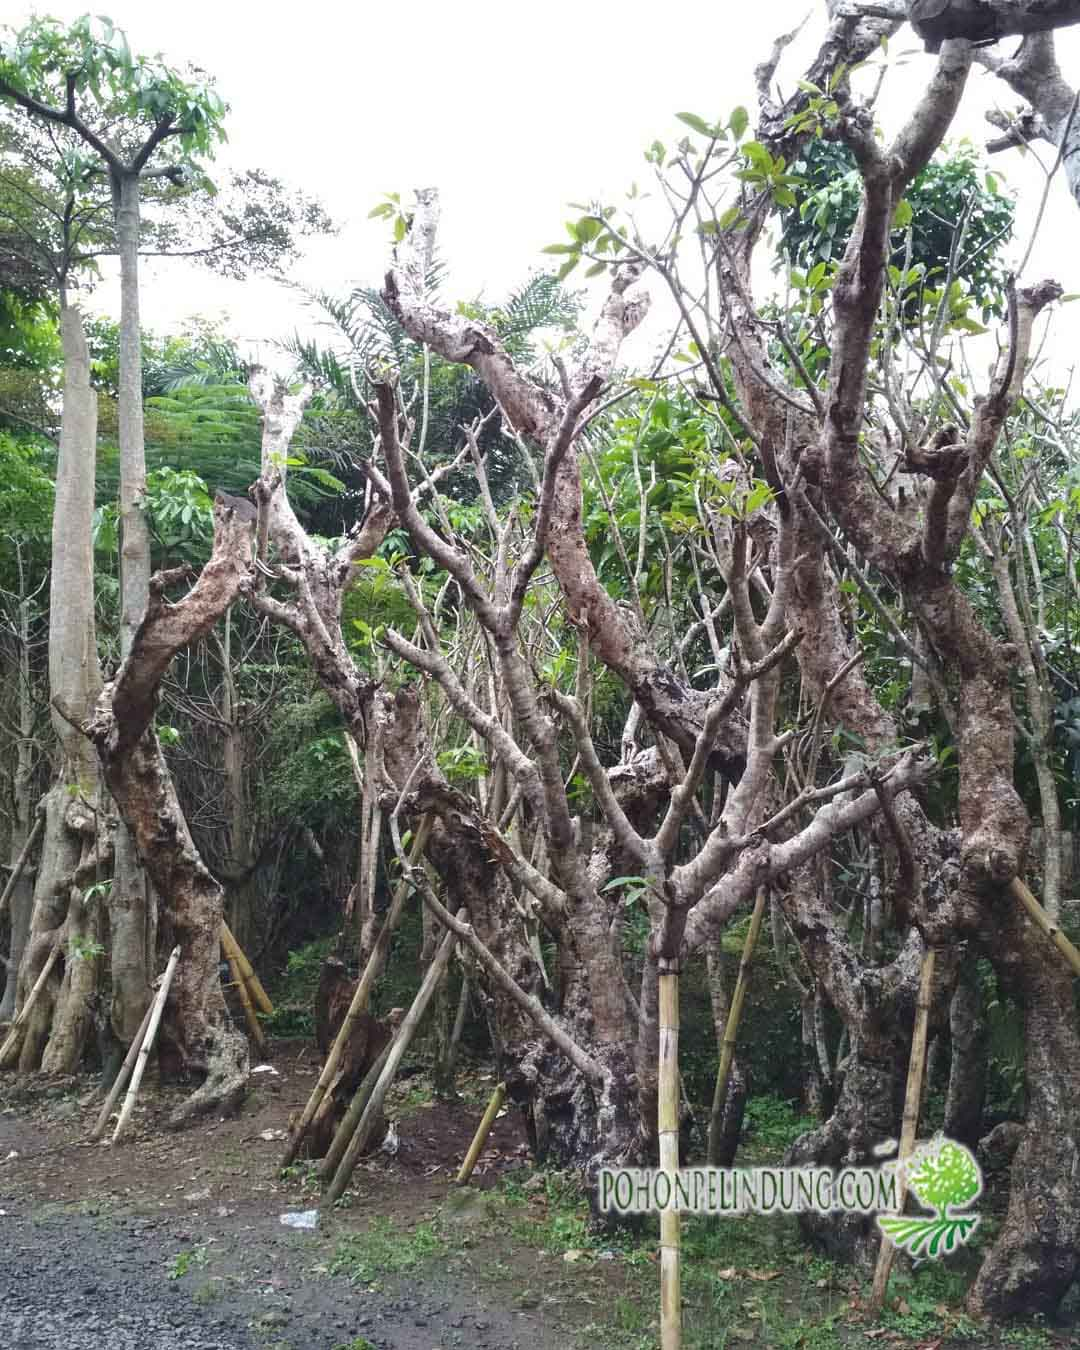 pusat pohon kamboja fosil